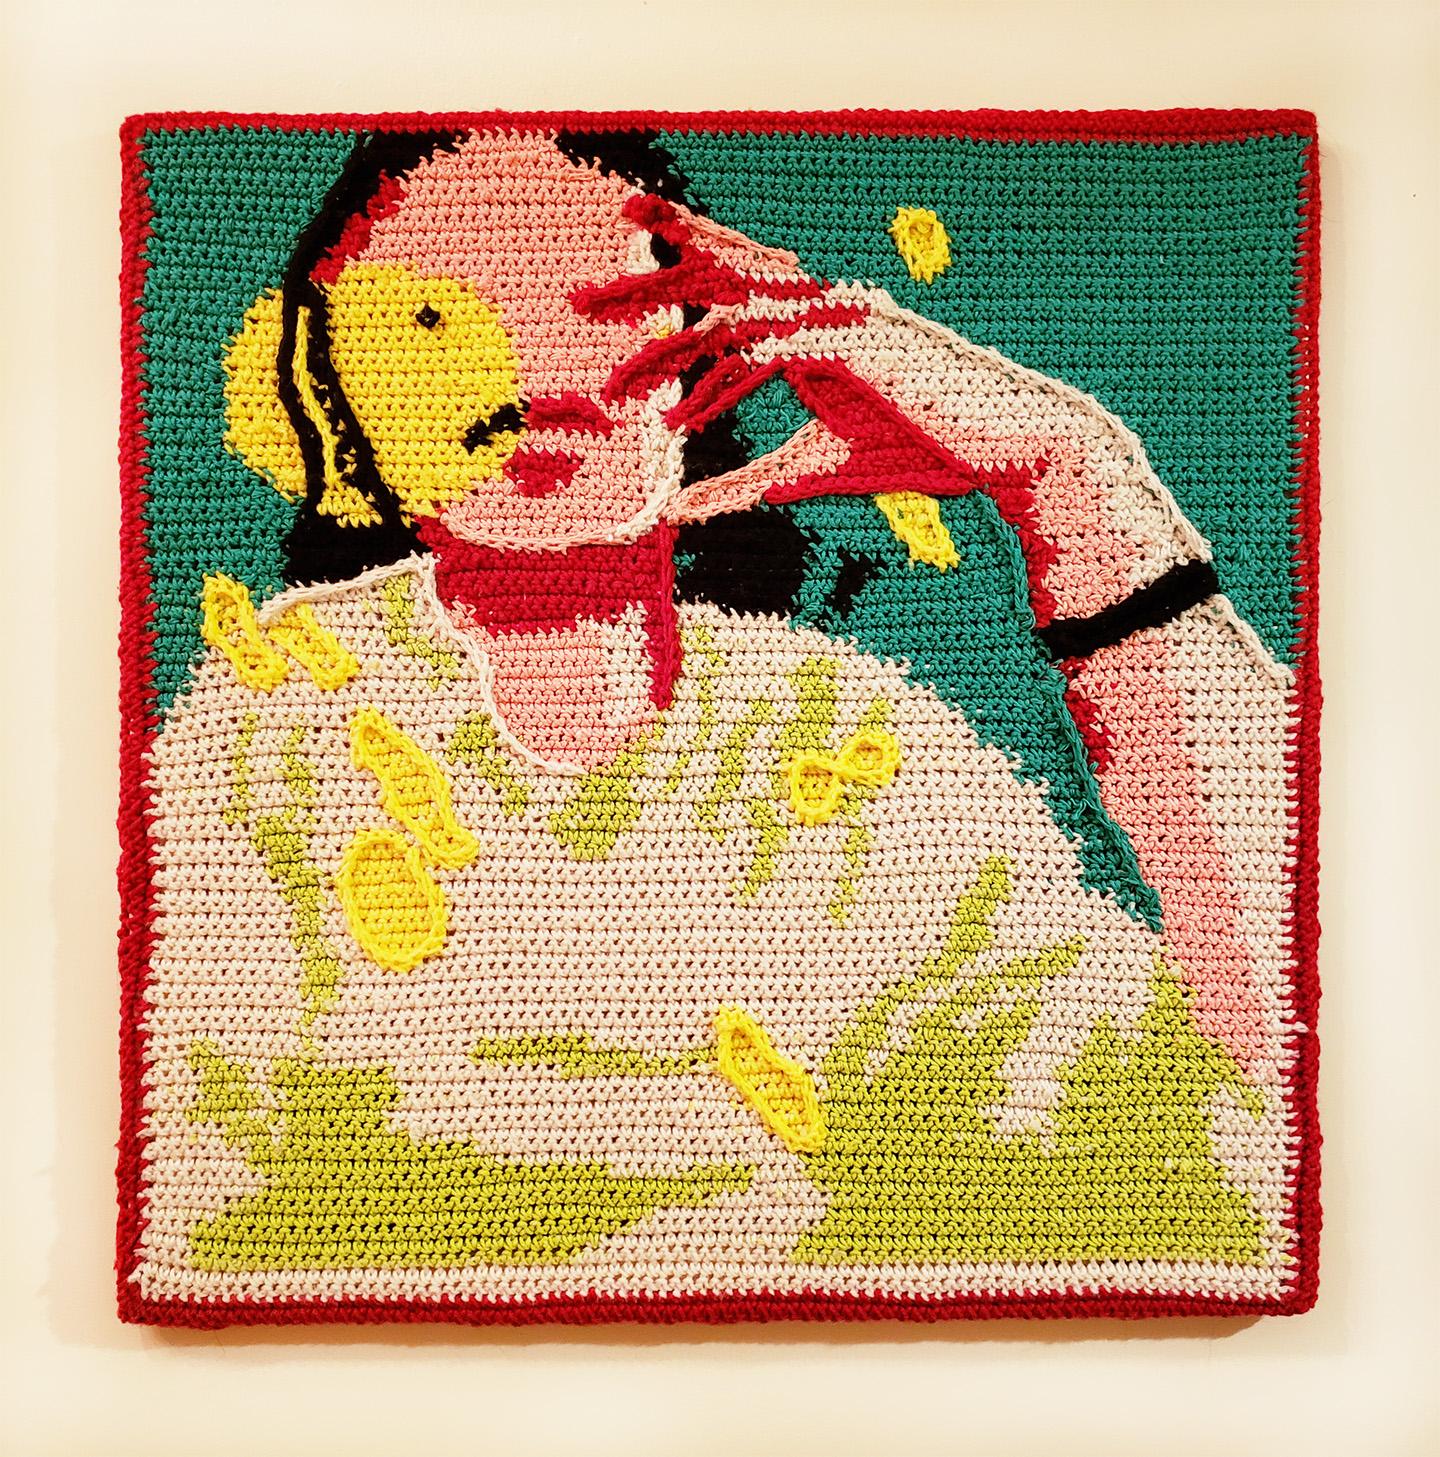 crochet study 1 - 72dpi.jpg